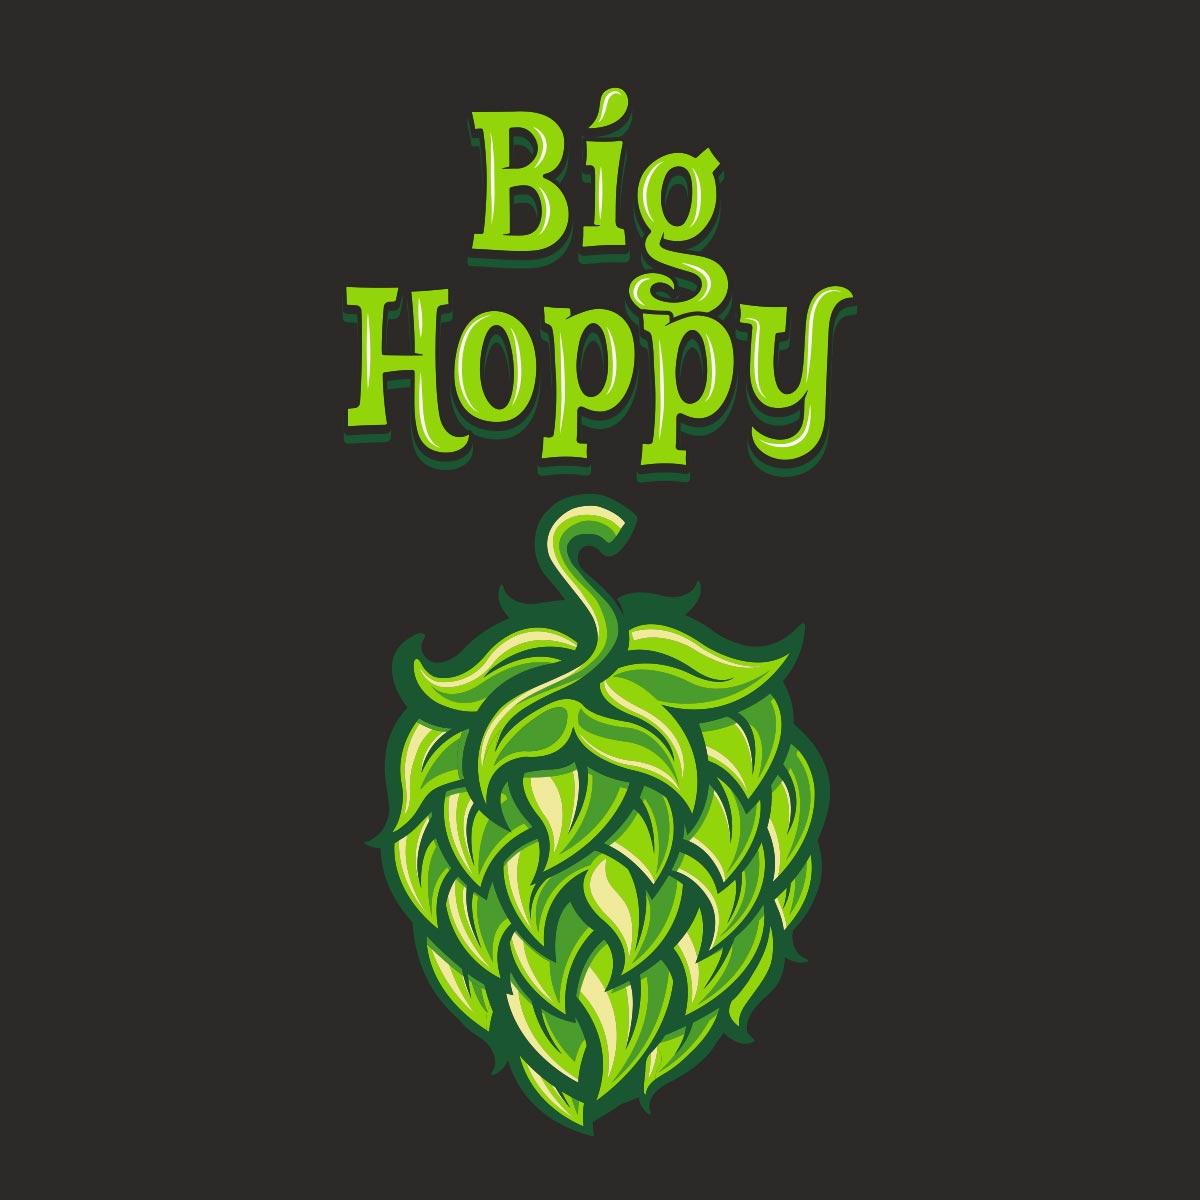 Big Hoppy